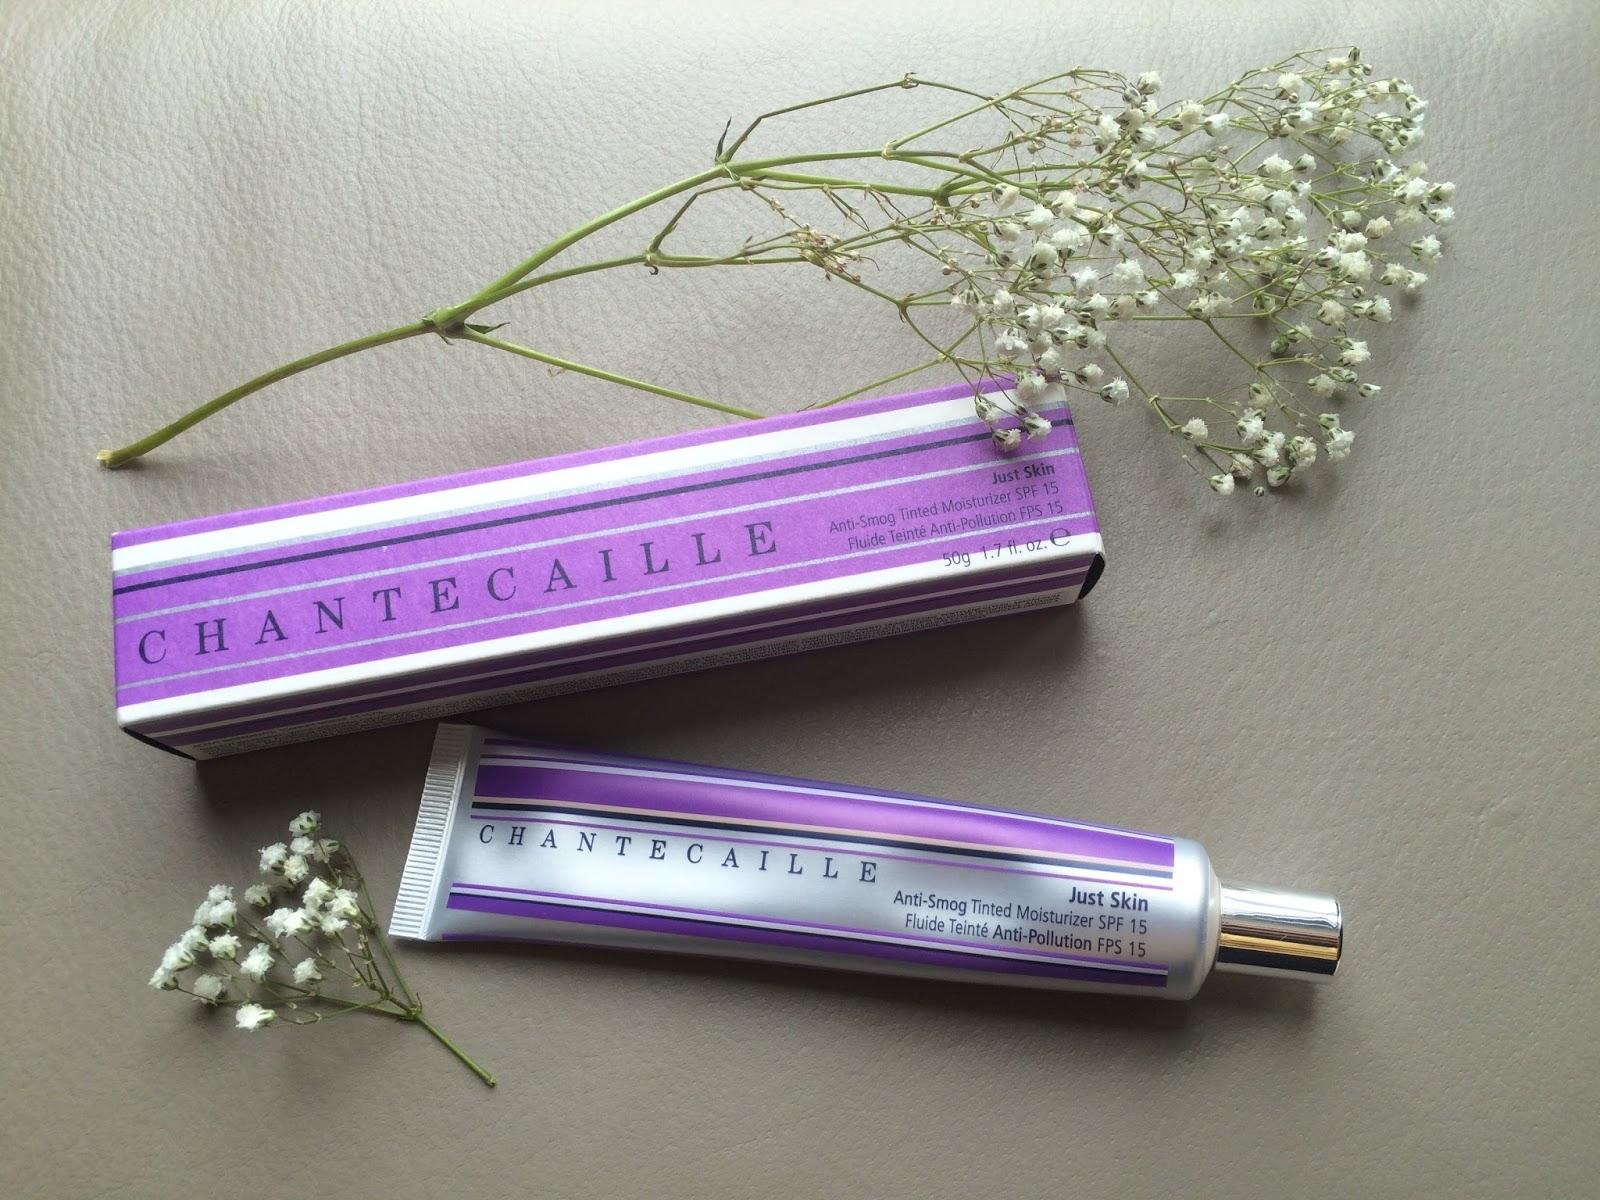 Chantecaille Just Skin Tinted Moisturizer Spf 15 Vanity Planet Glowspin Facial Brush - Not Ur Moms Purple